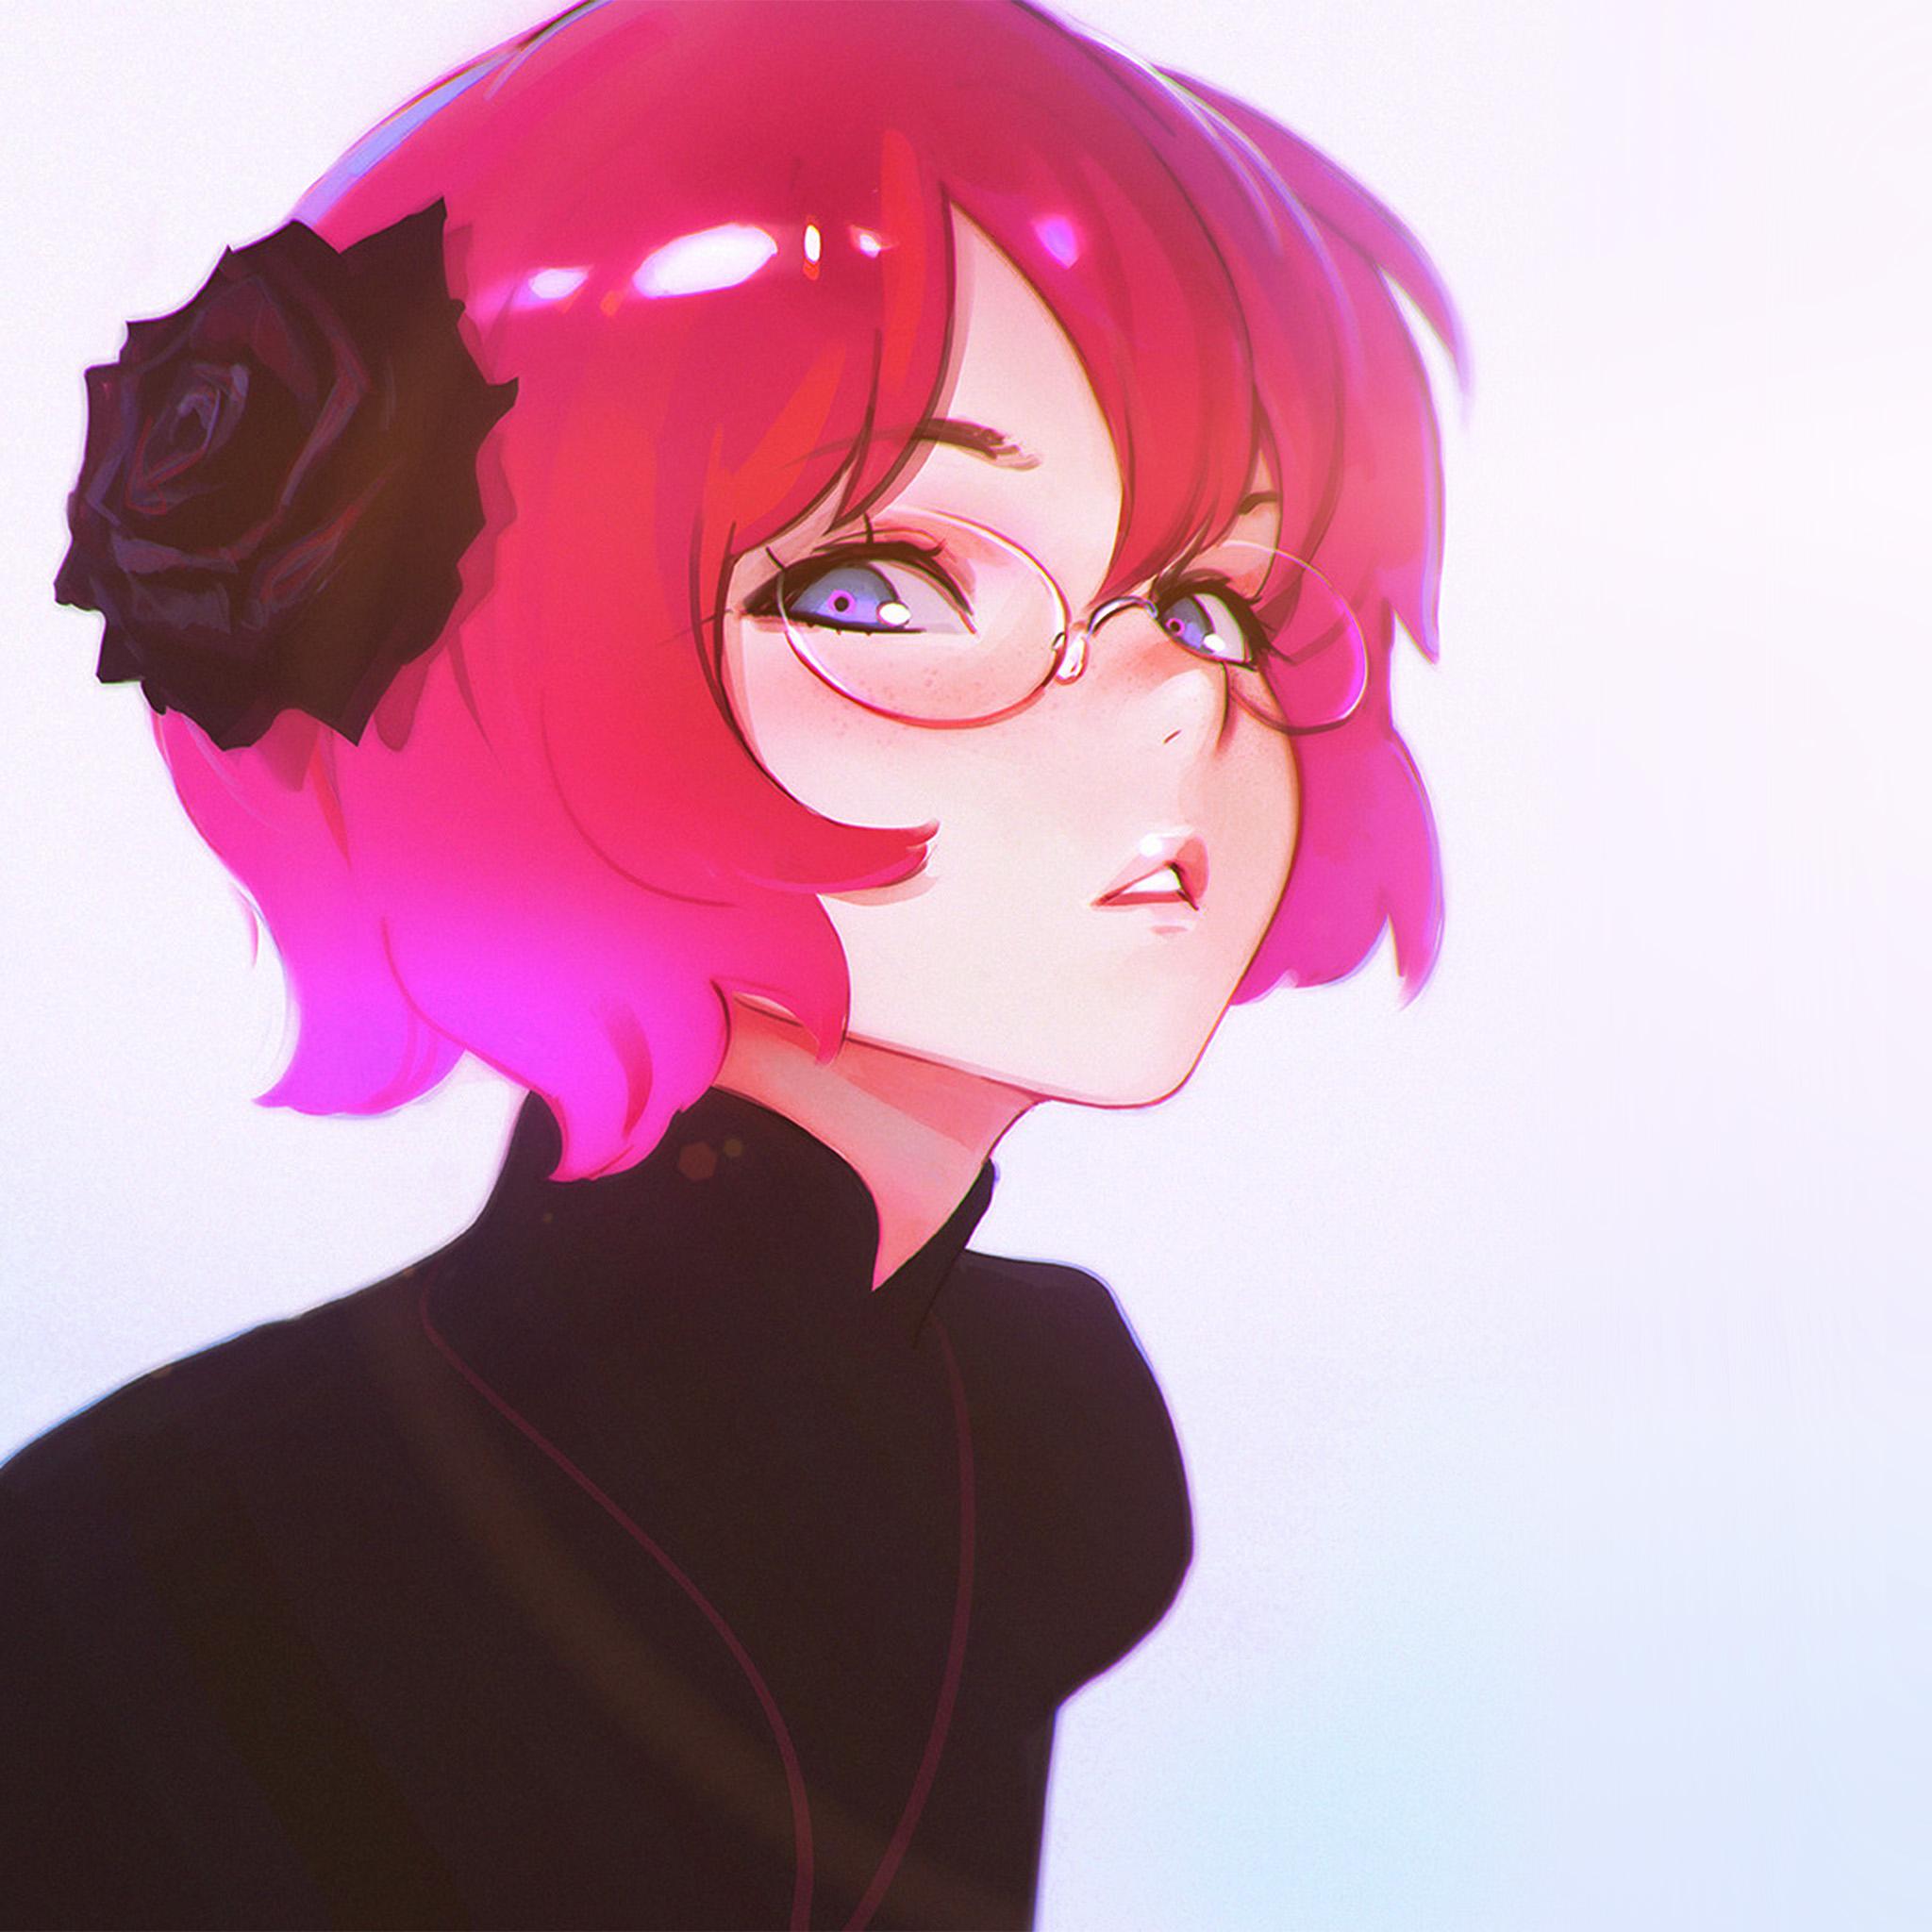 Pink Iphone: Av00-ilya-kuvshinov-girl-cute-pink-illustration-art-flare